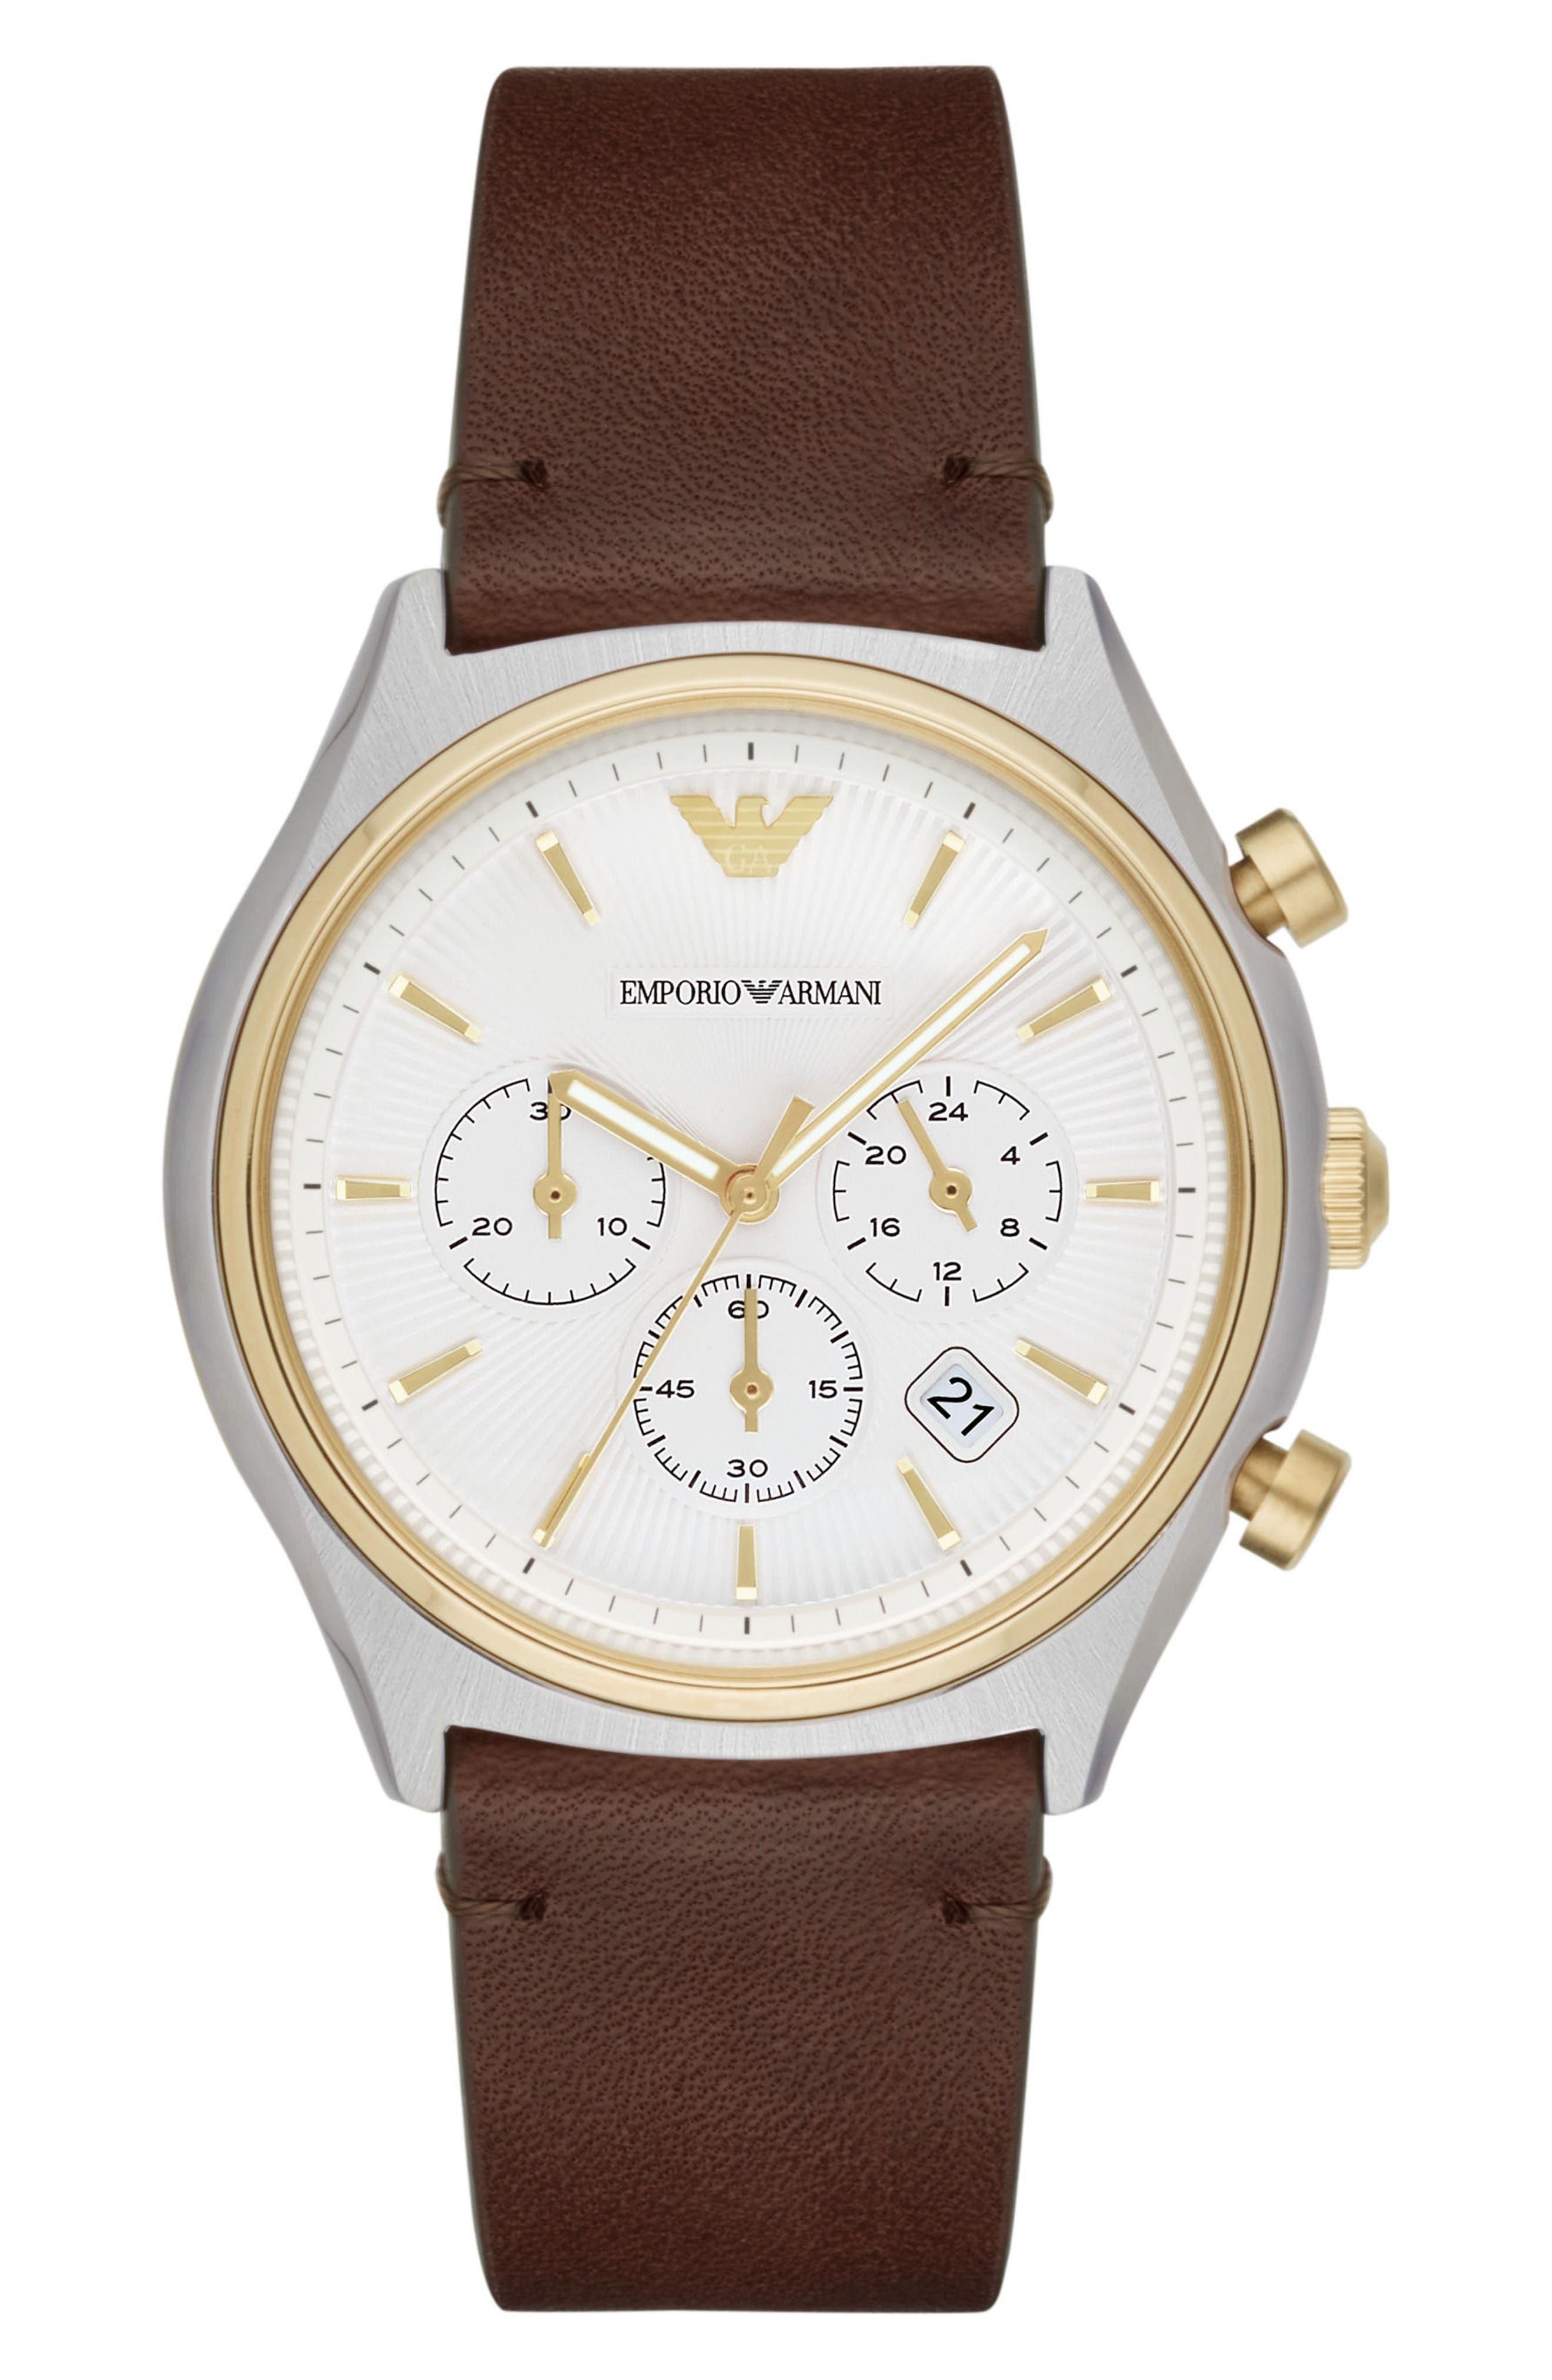 Main Image - Emporio Armani Chronograph Leather Strap Watch, 44mm